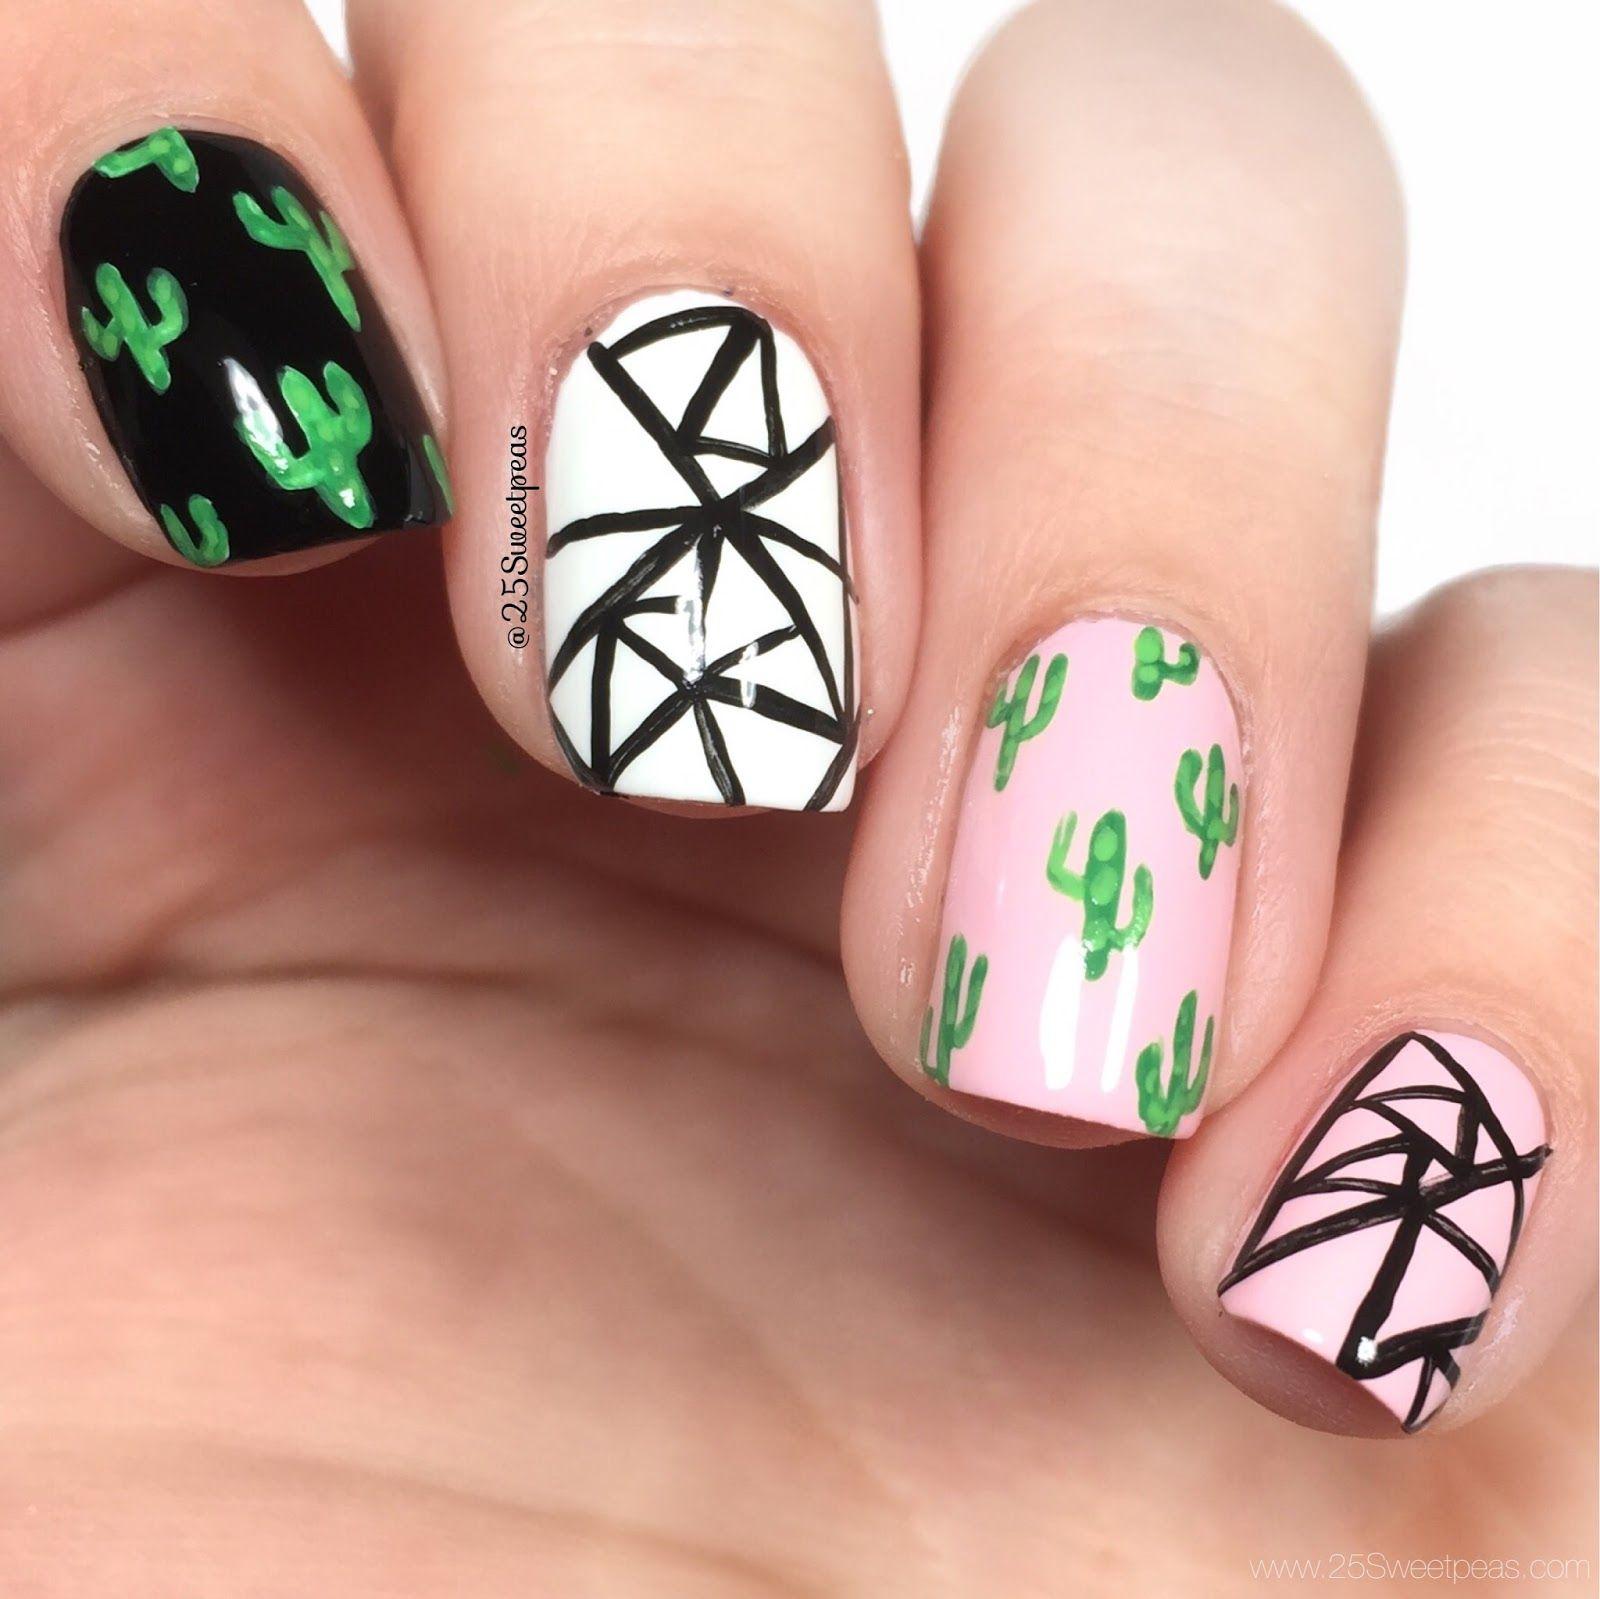 Cute Cactus Nail Art Succulent Nails Manicure Nail Designs